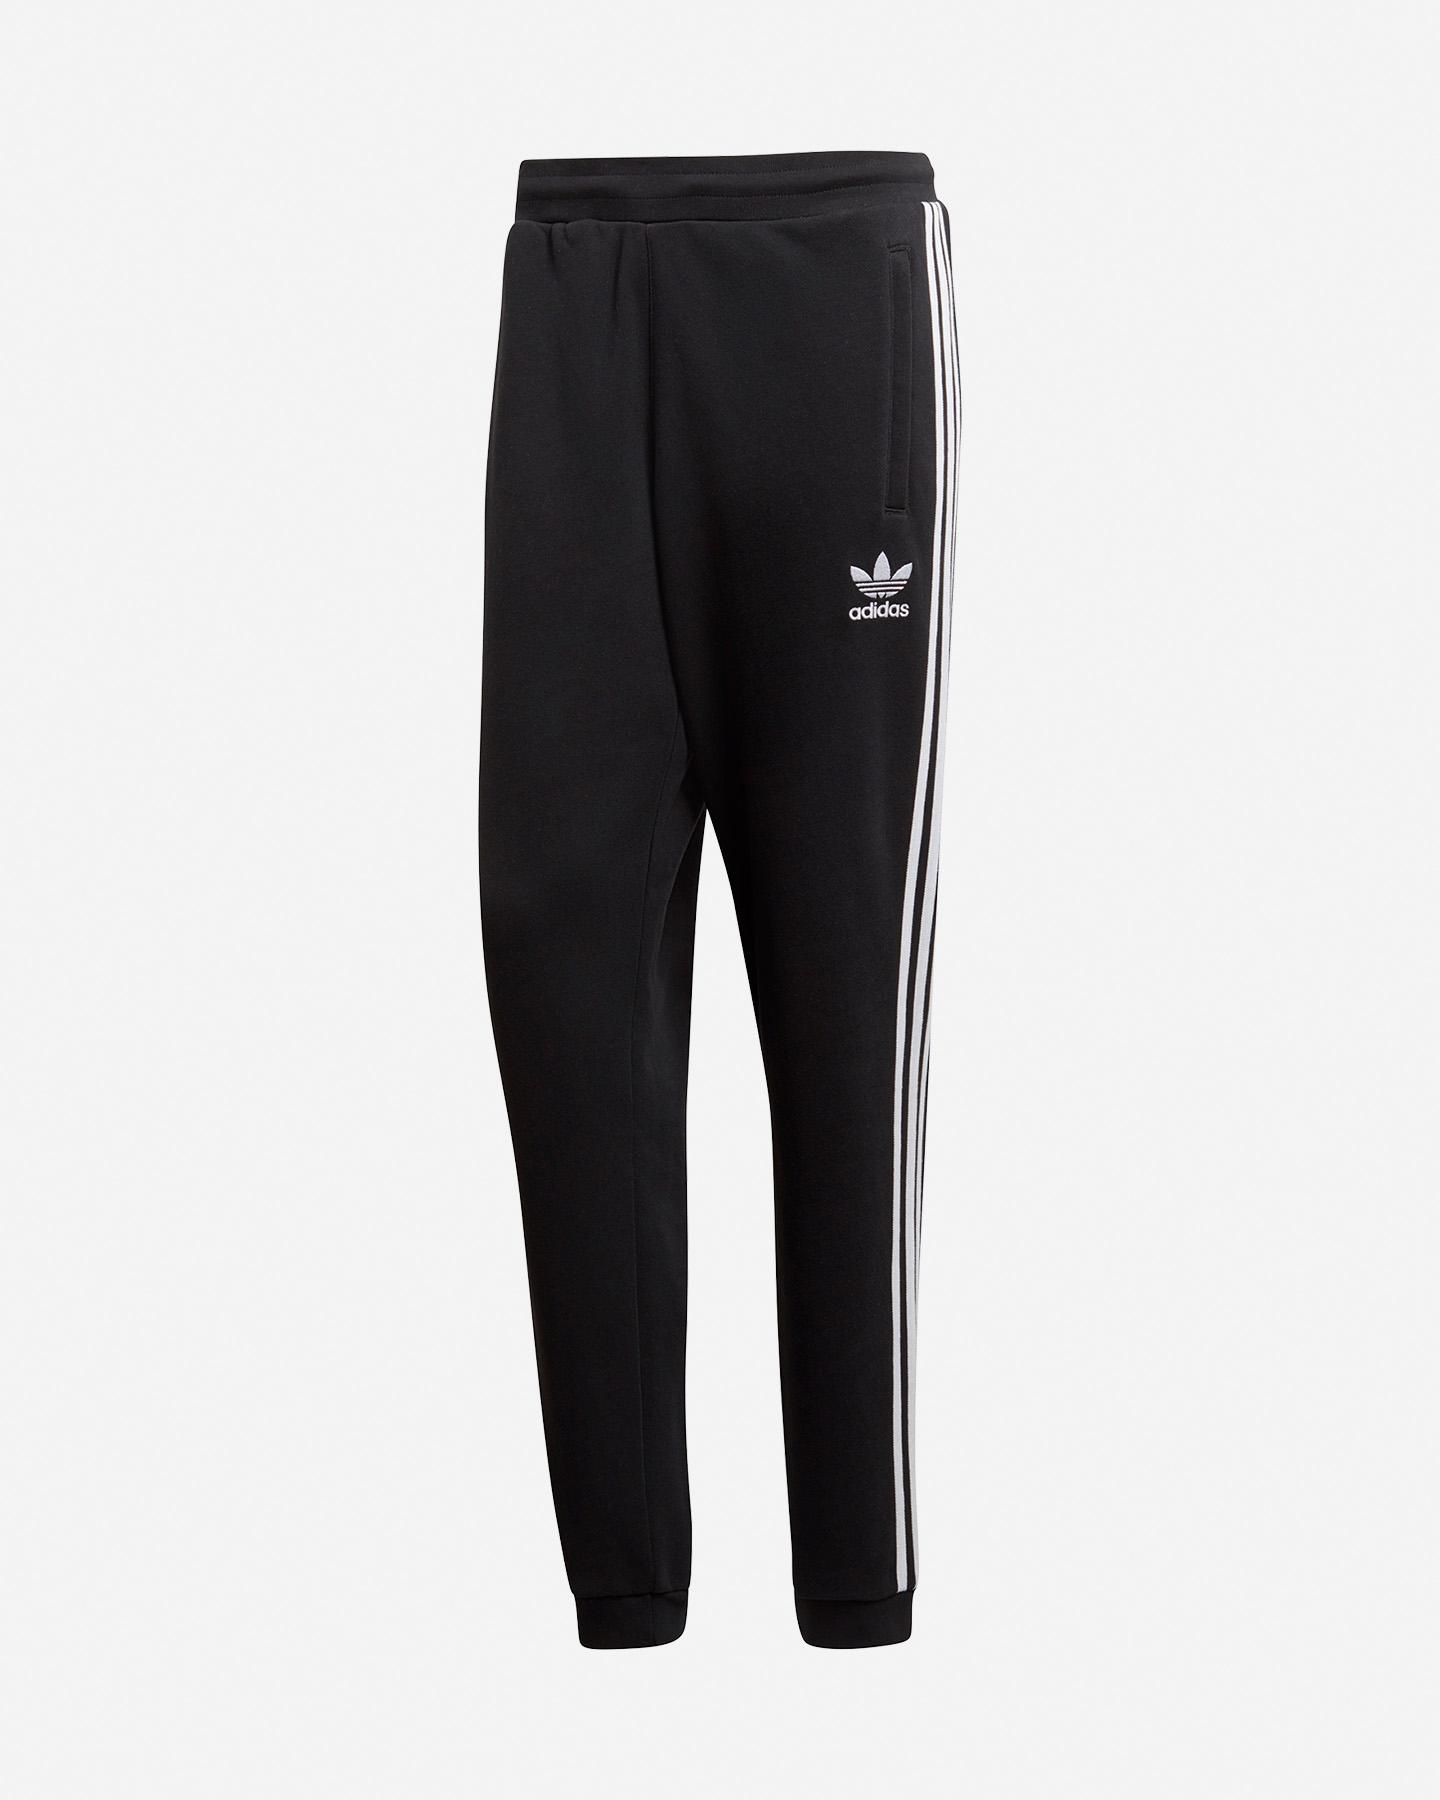 pantaloni 3 stripes adidas